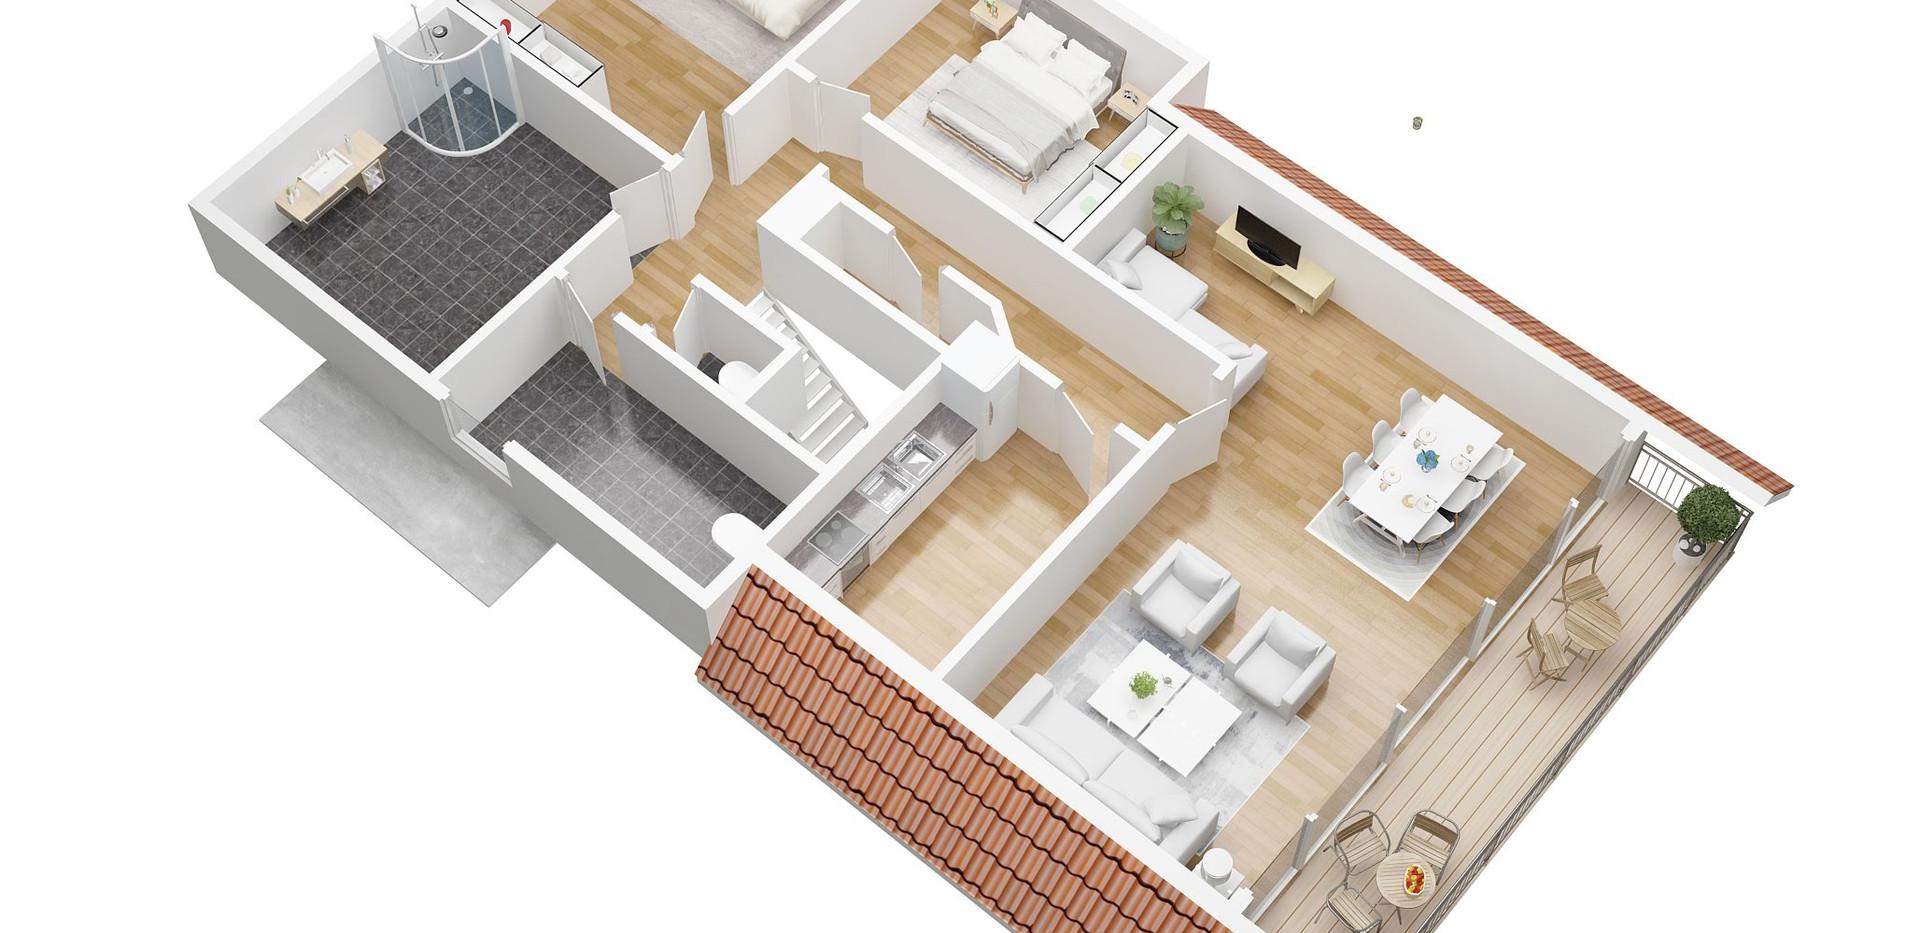 heggerkruessel_Firstfloor_3D  floor plan